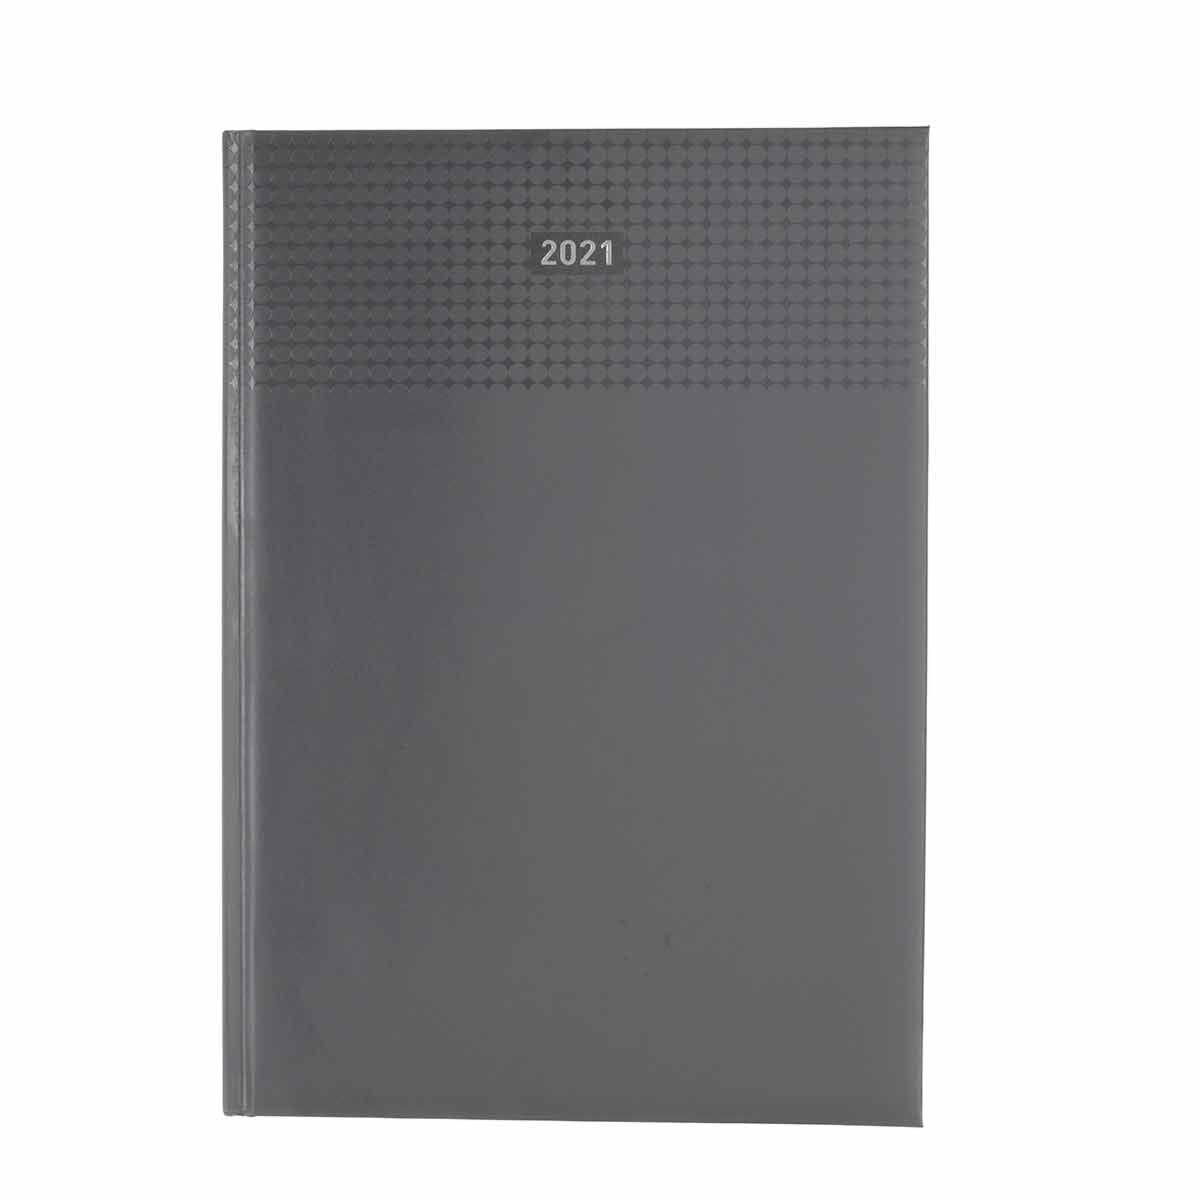 Ryman Langham Diary Week to View A4 2021 Grey